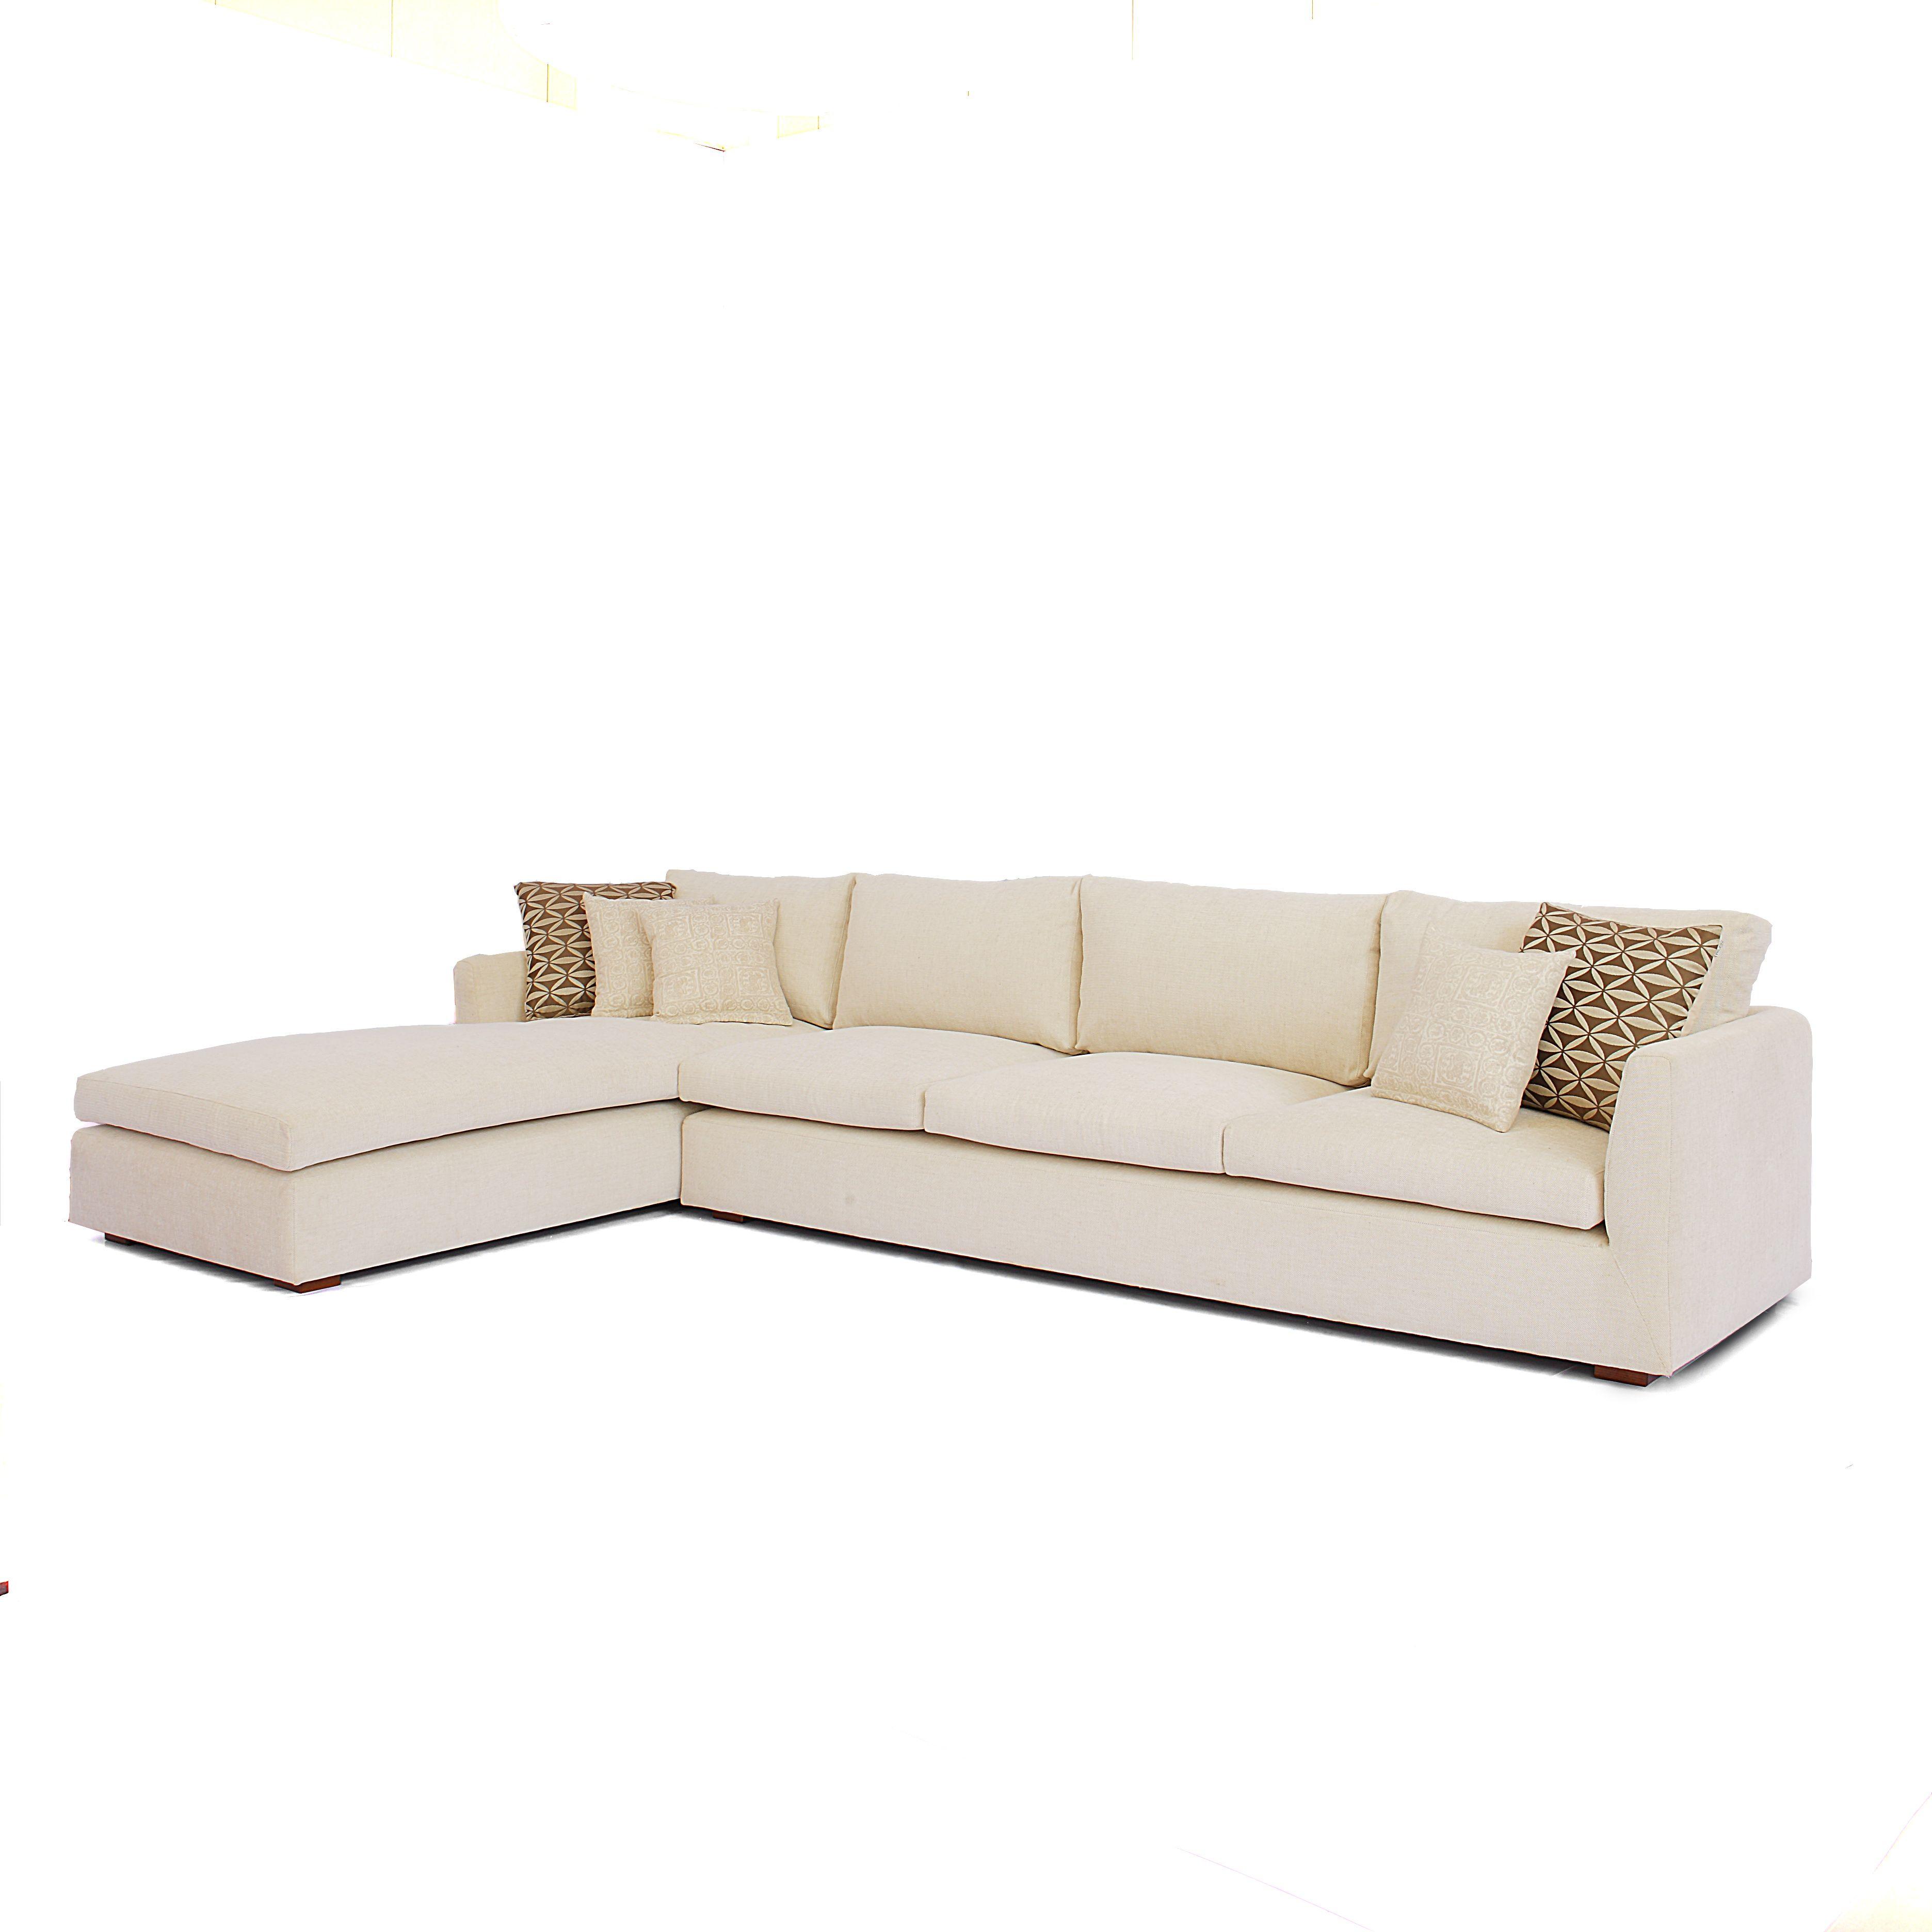 Eklego Design L Shape Exchange Sofa Made In Egypt Futura Casa